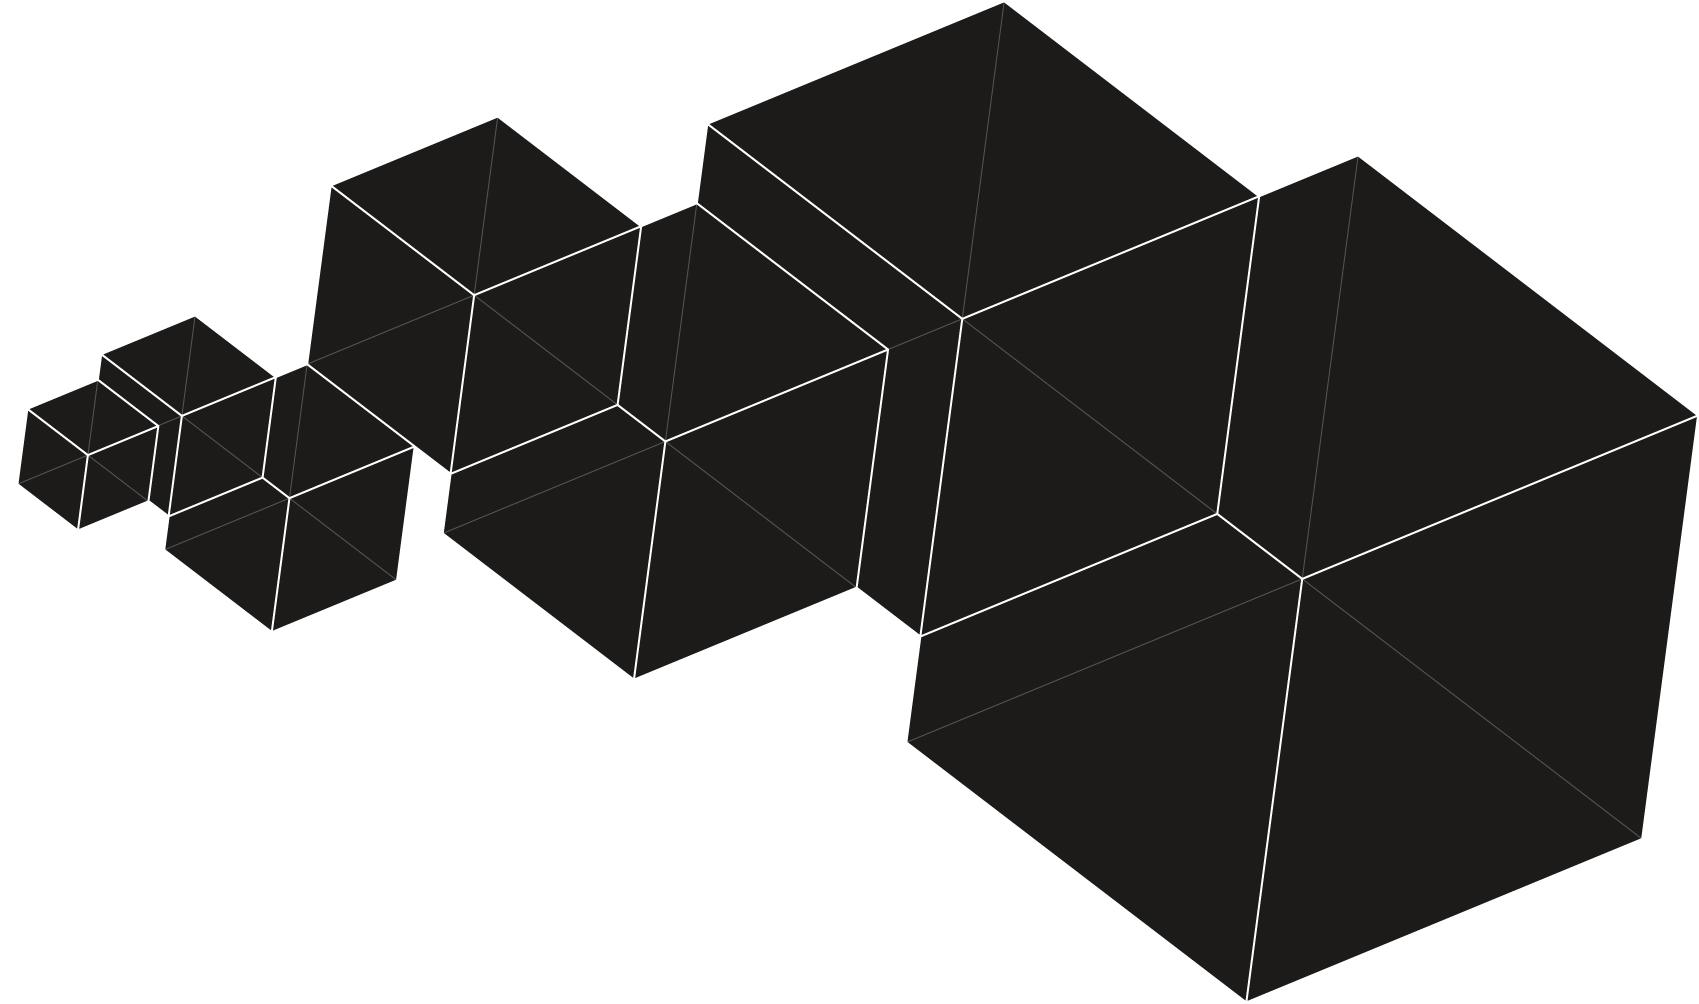 HEXAGONS_07.jpg